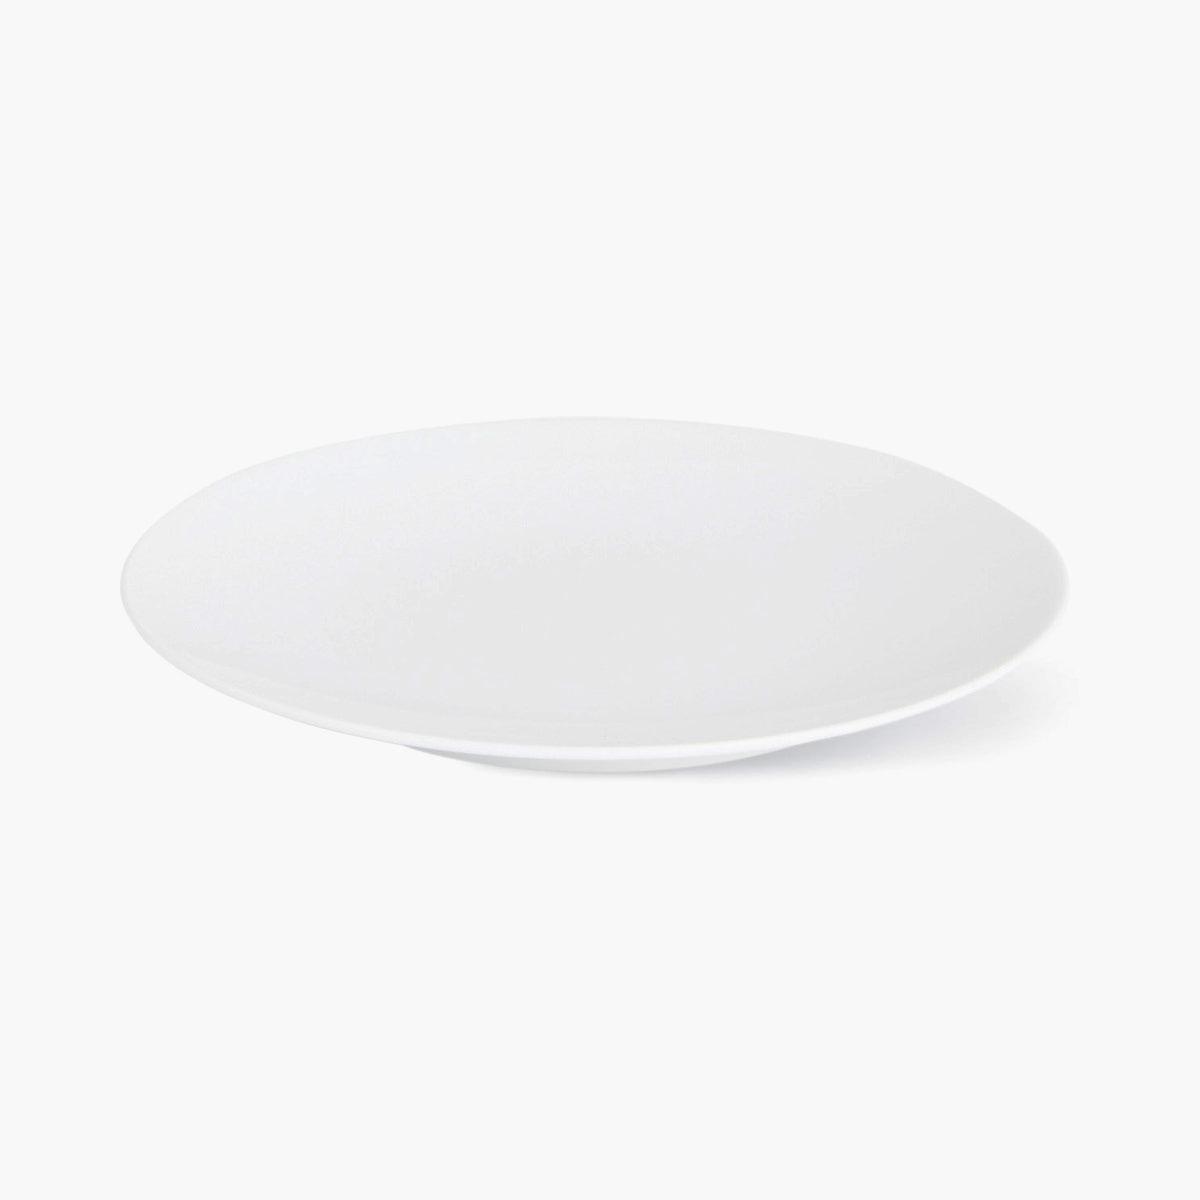 TAC 02 Bread Plate